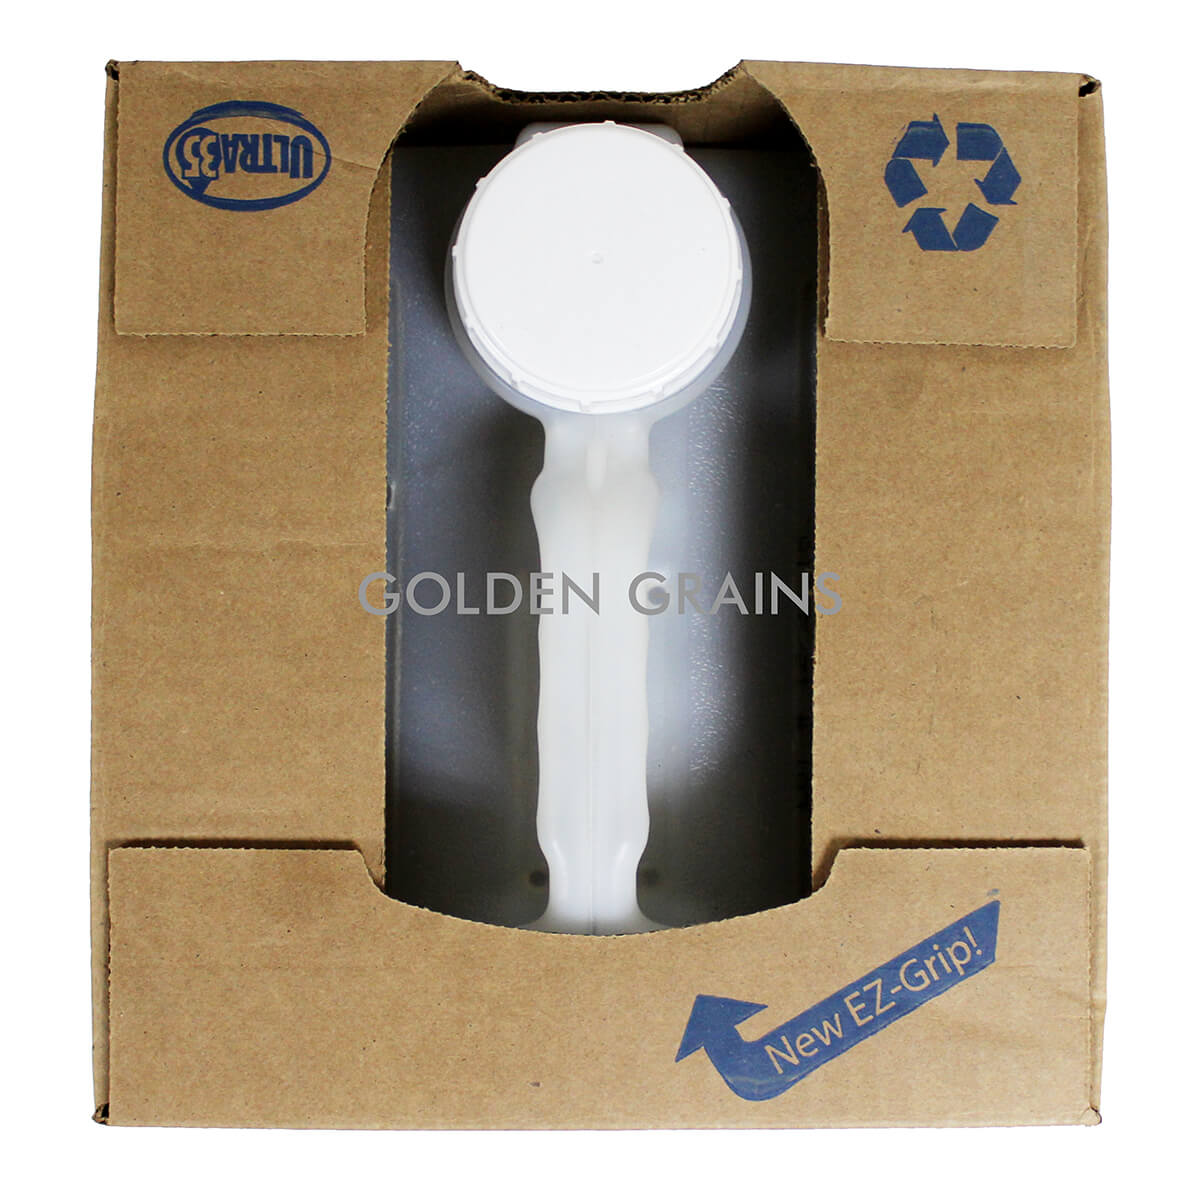 Golden Grains Dubai Export - Golden Chef - Clear Fry - Back.jpg